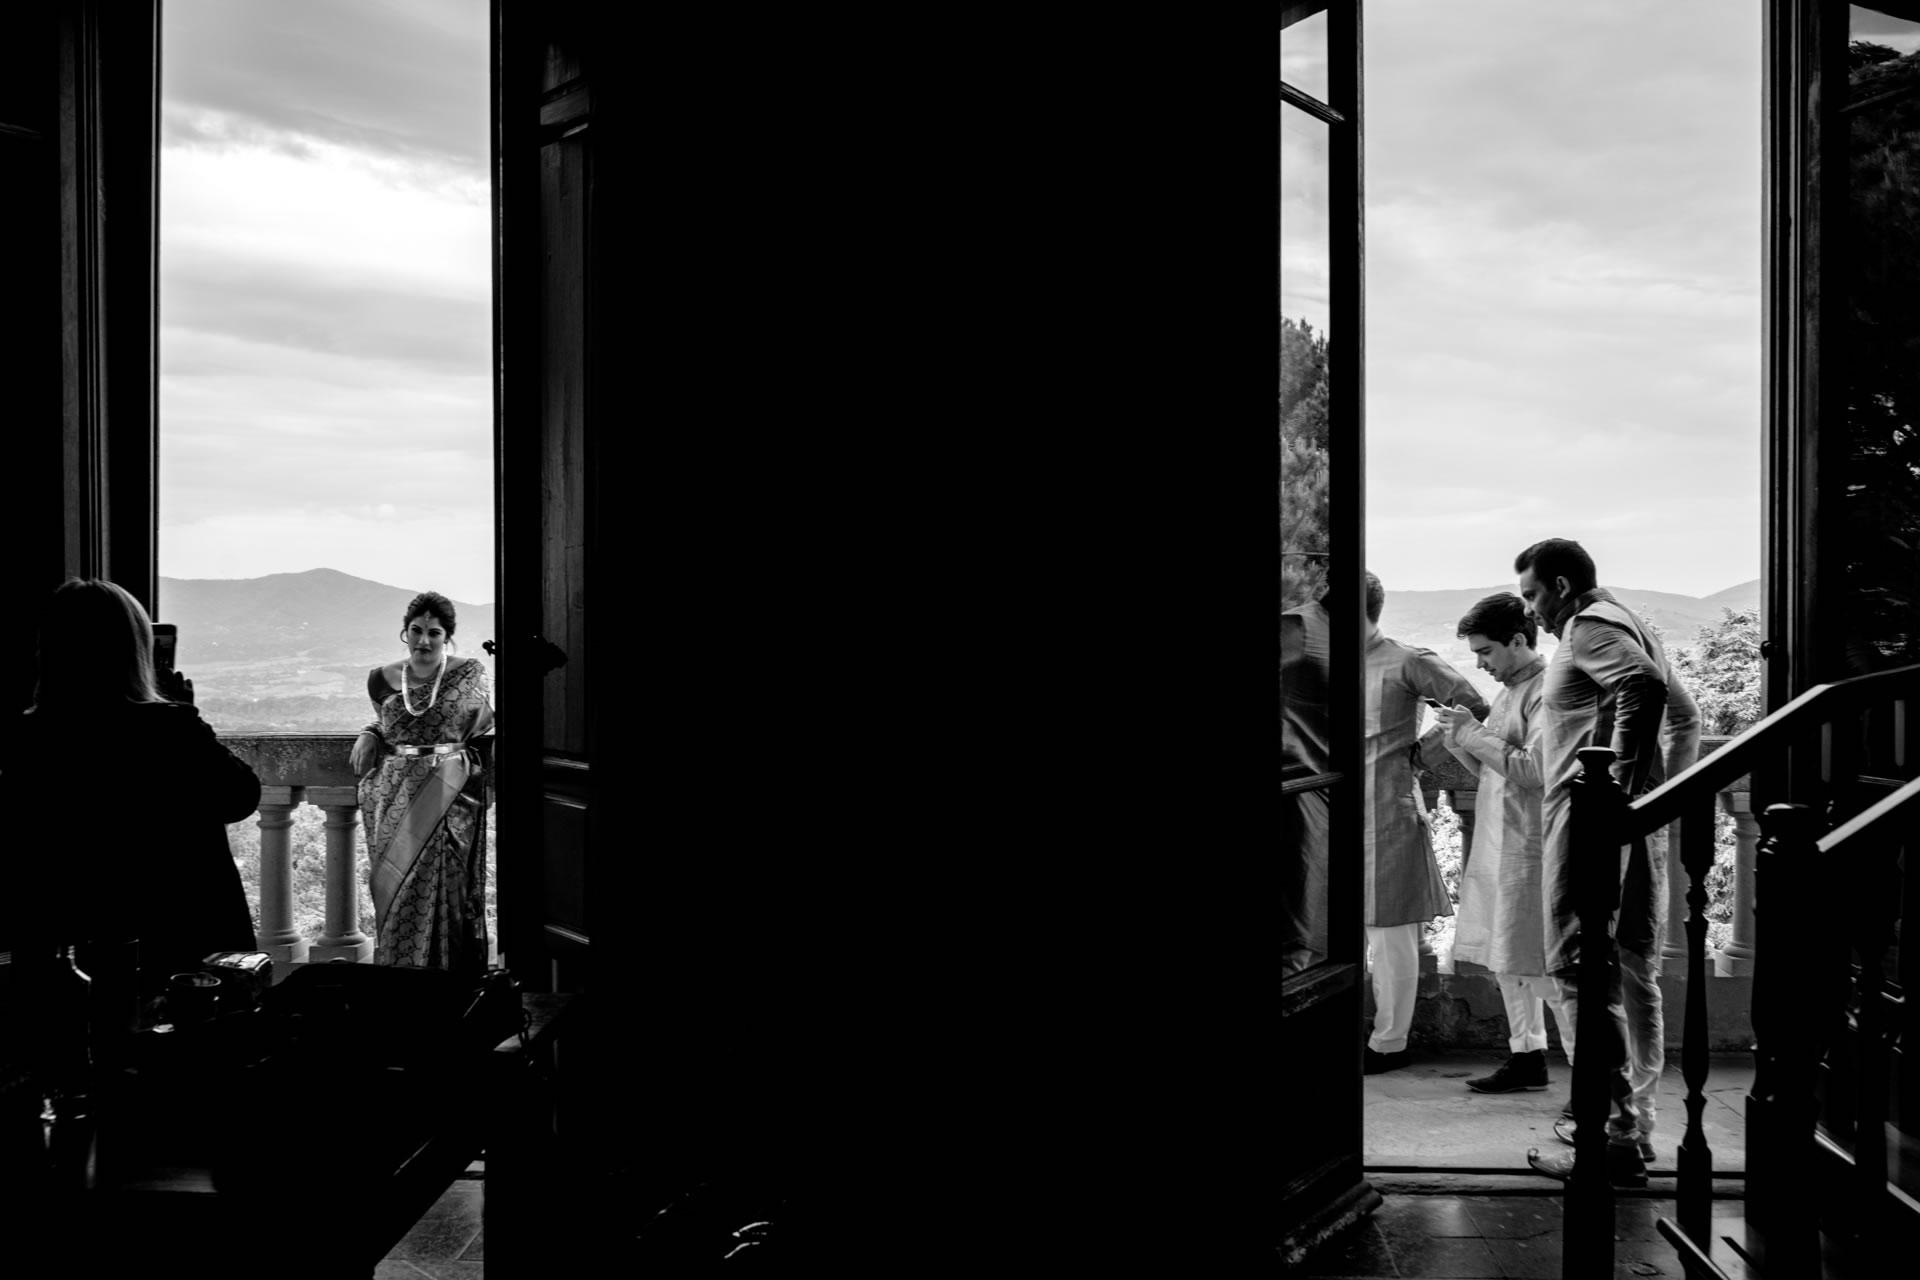 - 11 :: Indian wedding ceremony at Villa Pitiana :: Luxury wedding photography - 10 ::  - 11